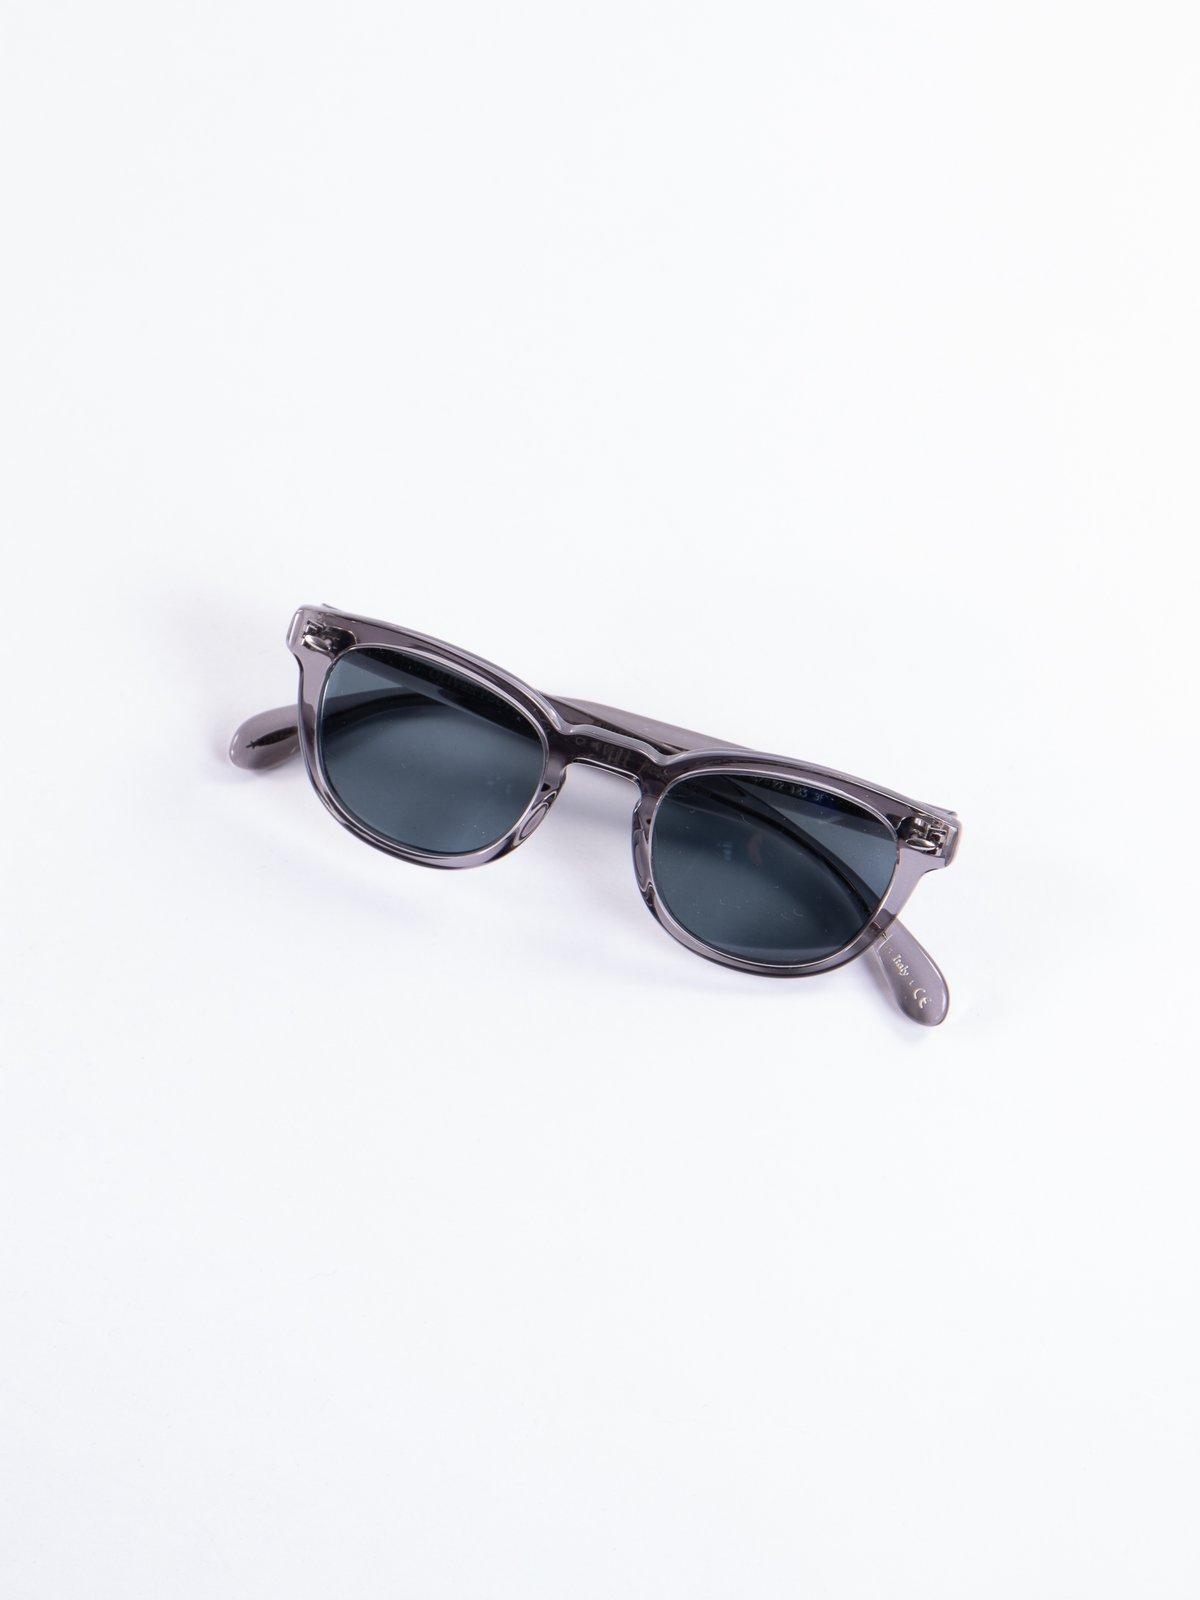 Workman Grey Sheldrake Sunglasses - Image 1